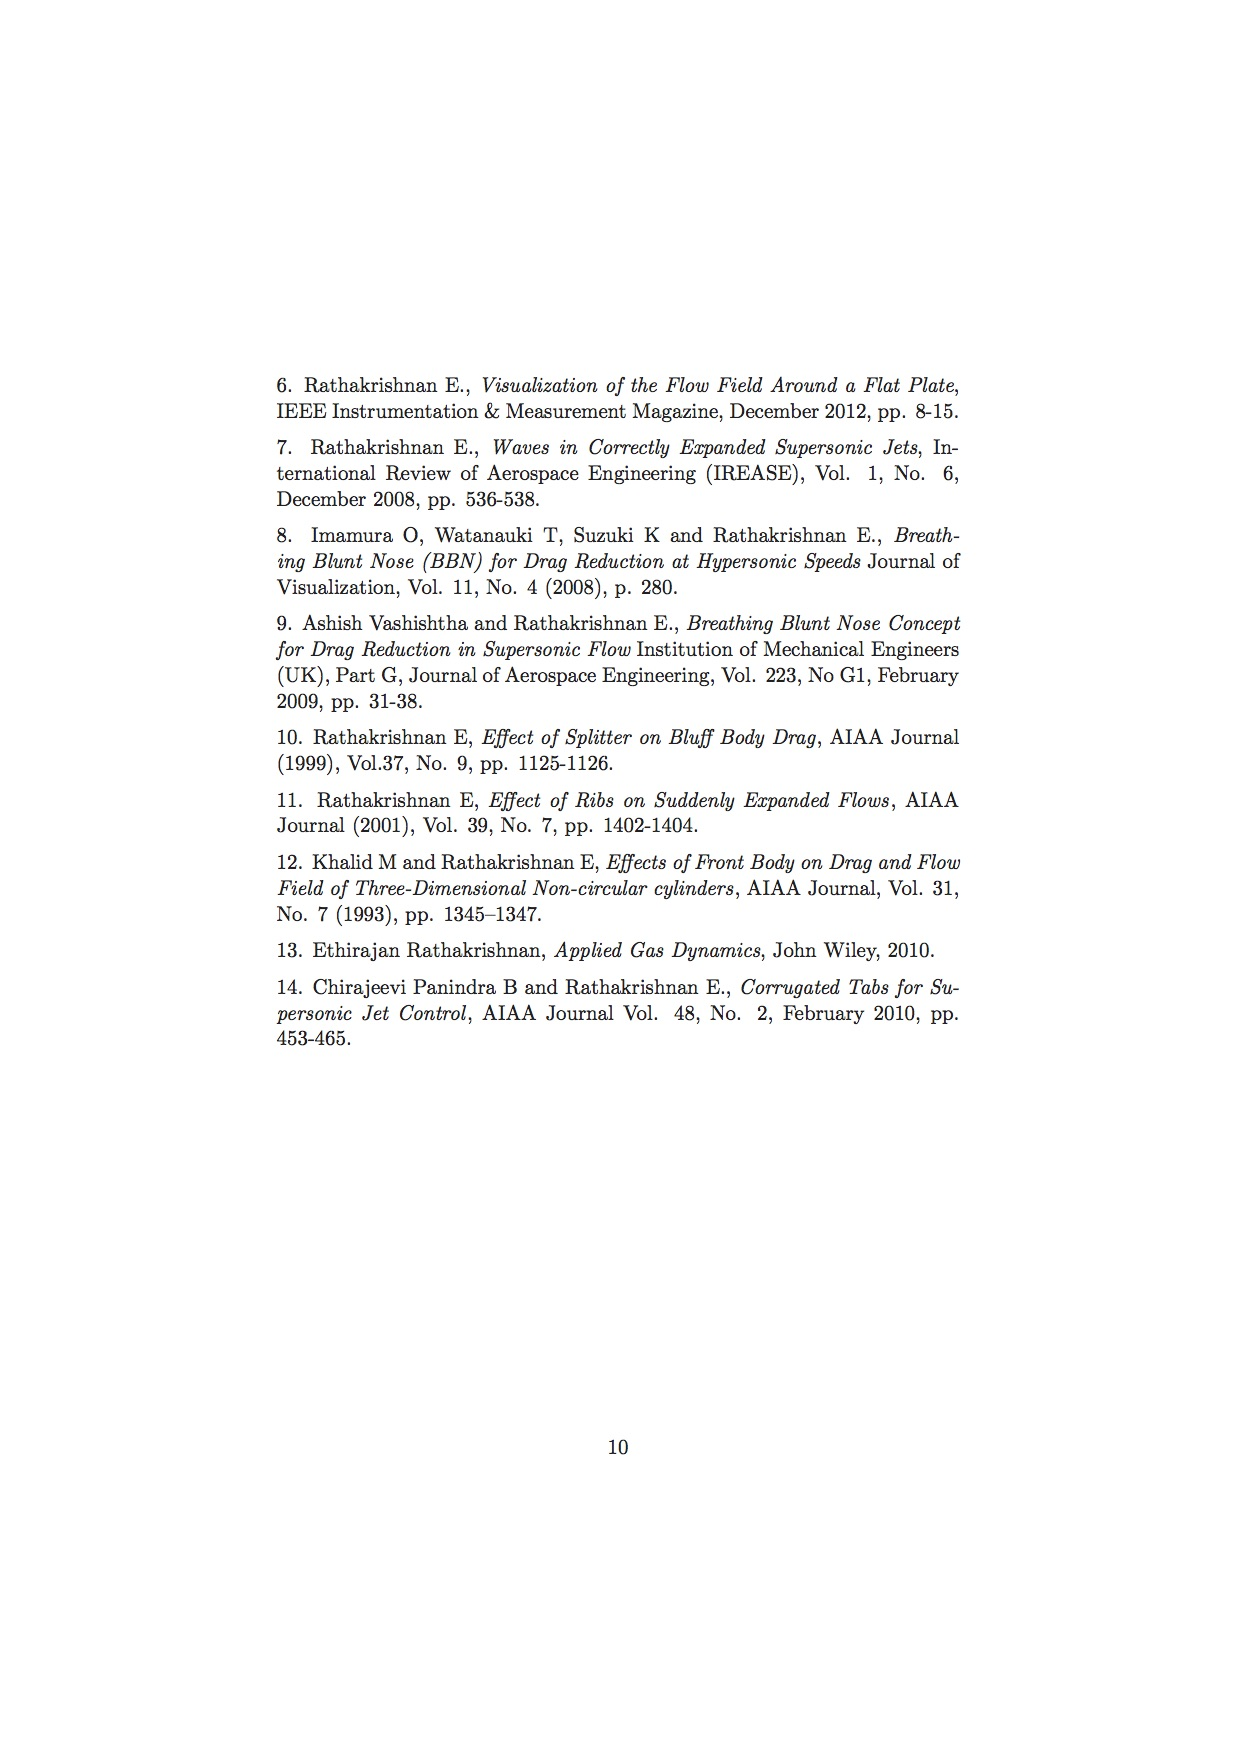 Professor Rathakrishnan's page